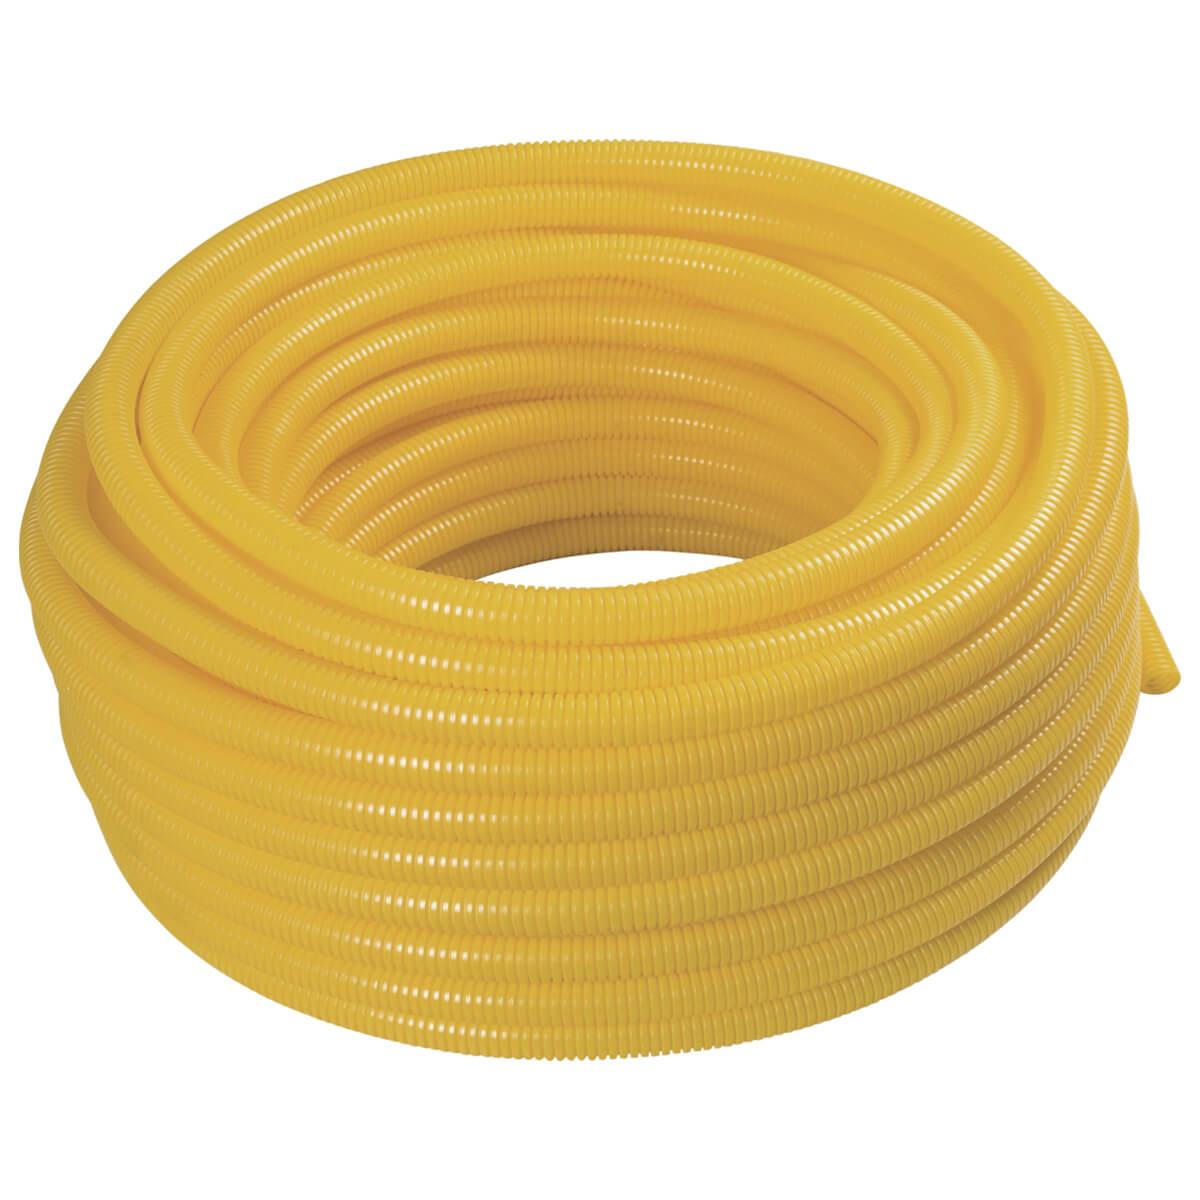 "Eletroduto Corrugado 3/4"" 50 Metros Amarelo - Krona"